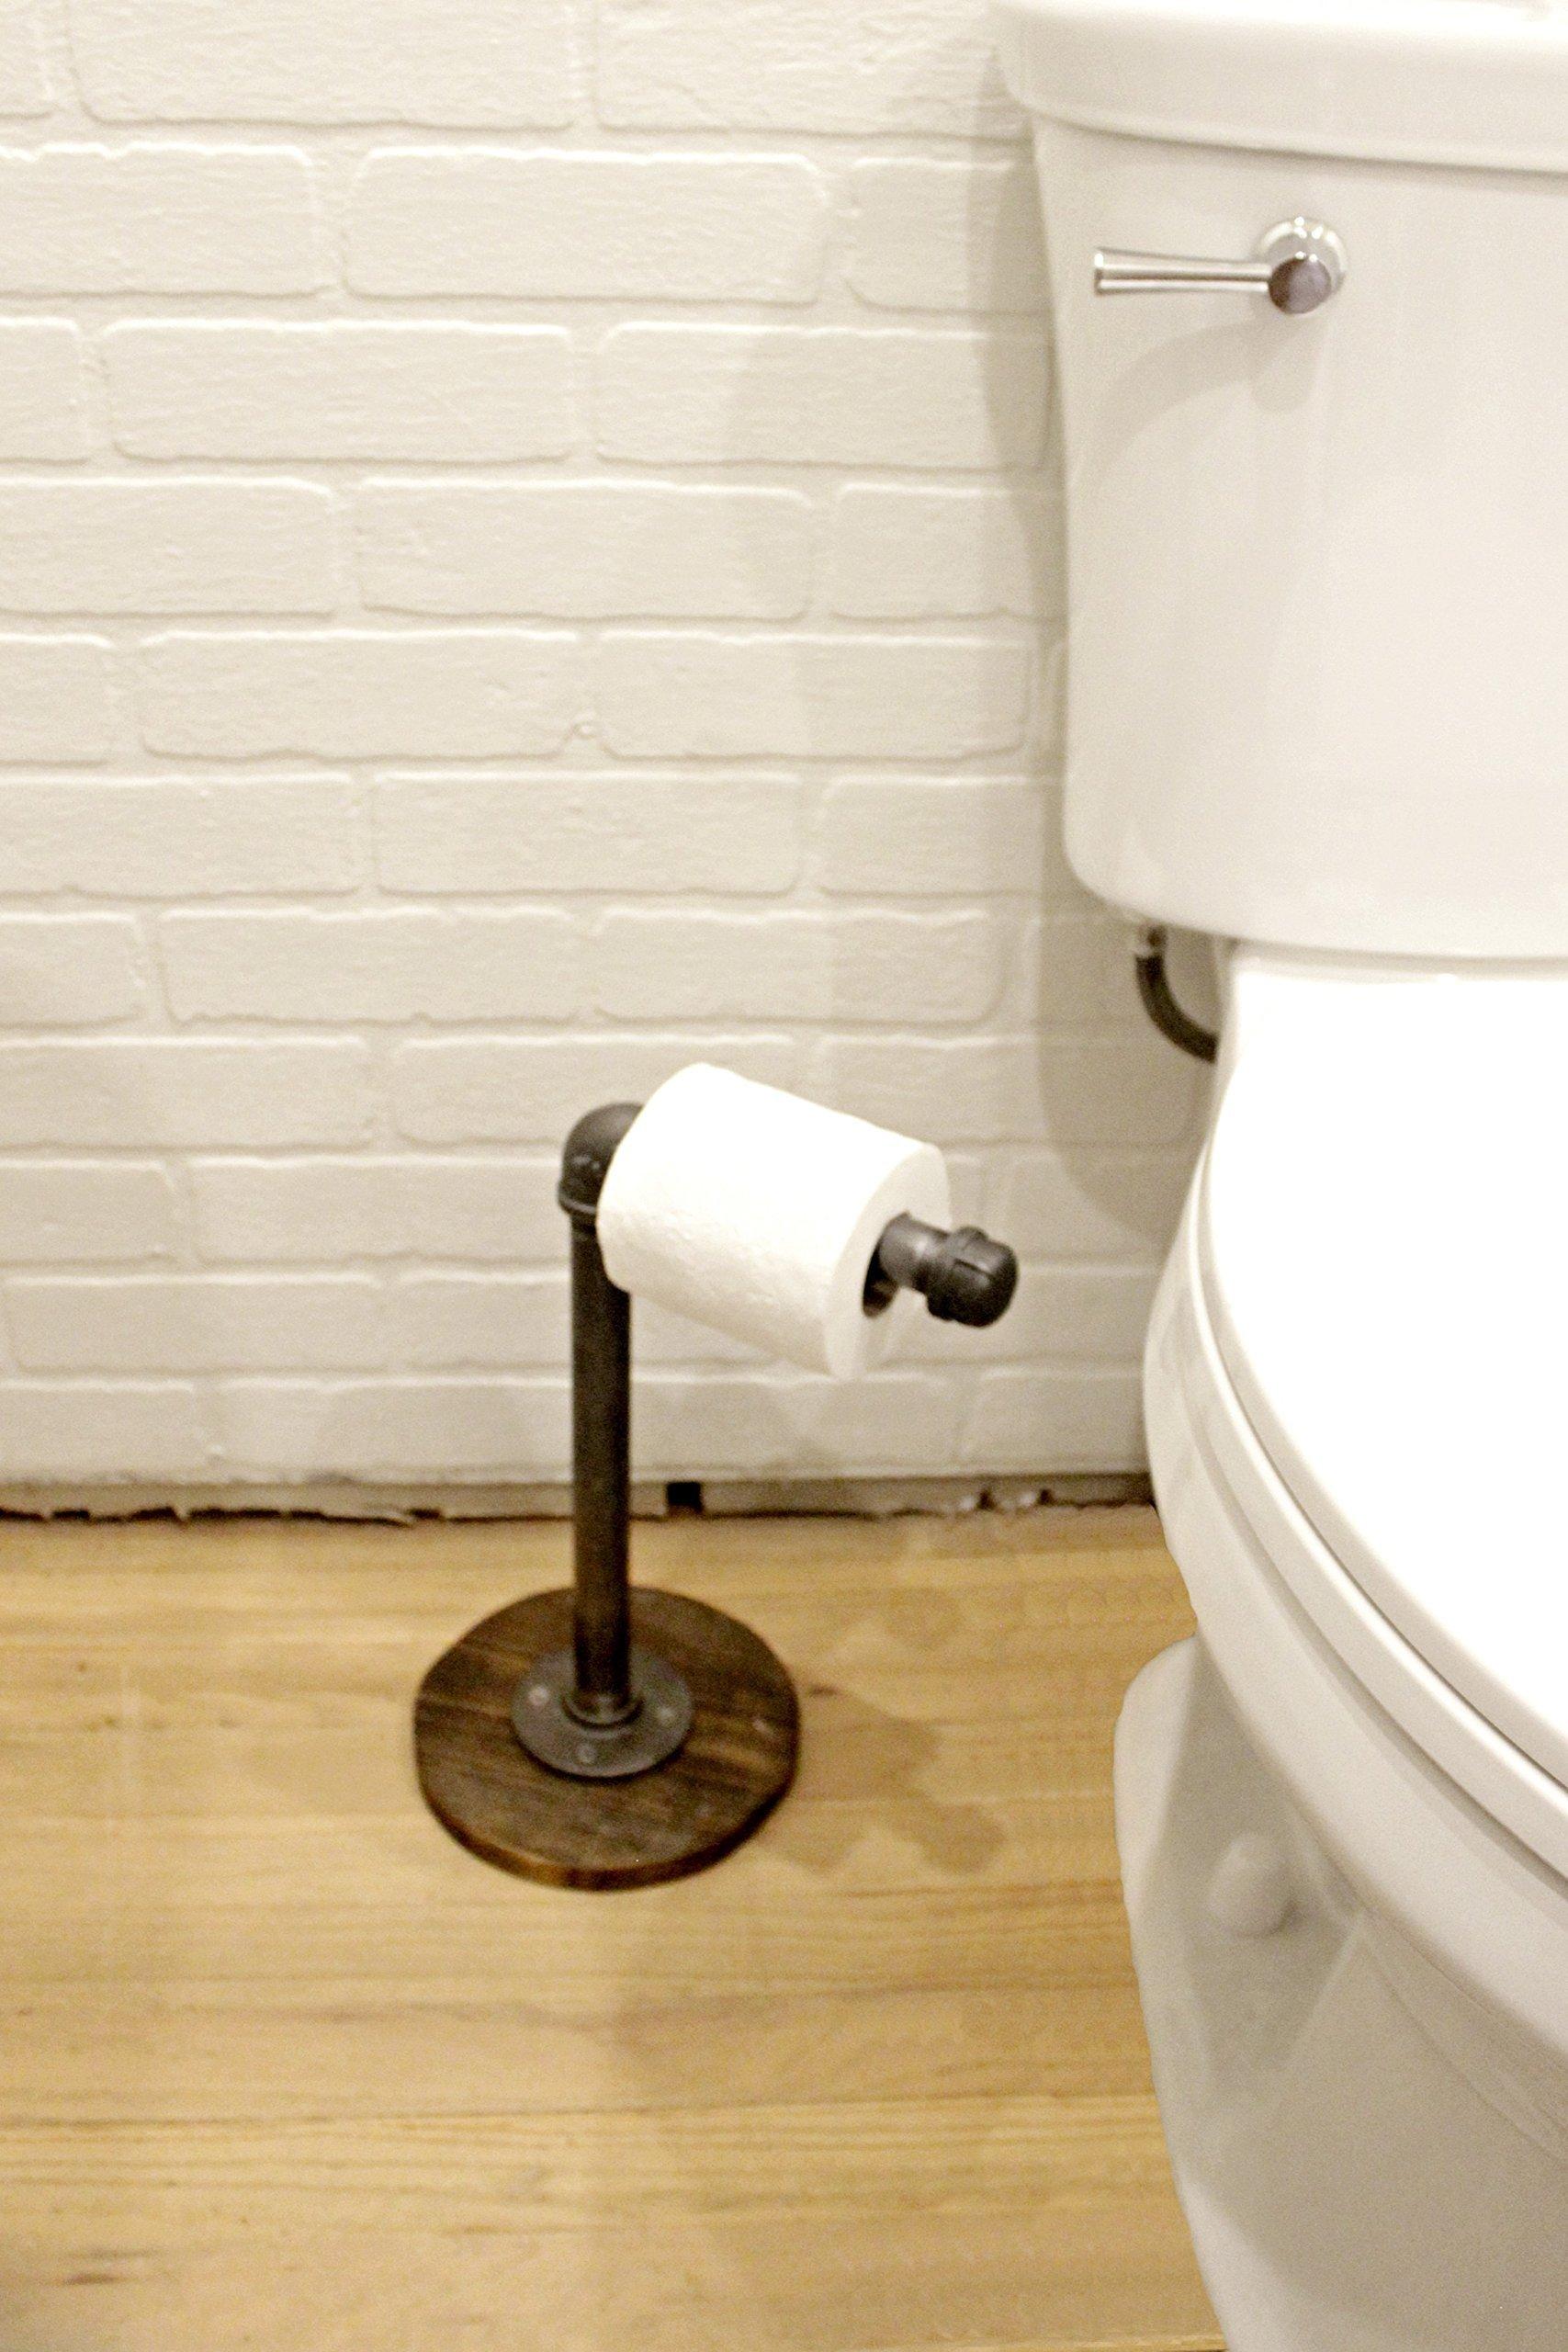 Freestanding Industrial Pipe Toilet Paper Holder stand, Toilet Roll Holder Industrial Farmhouse Bathroom decor, Bathroom fixture, Industrial Decor 4